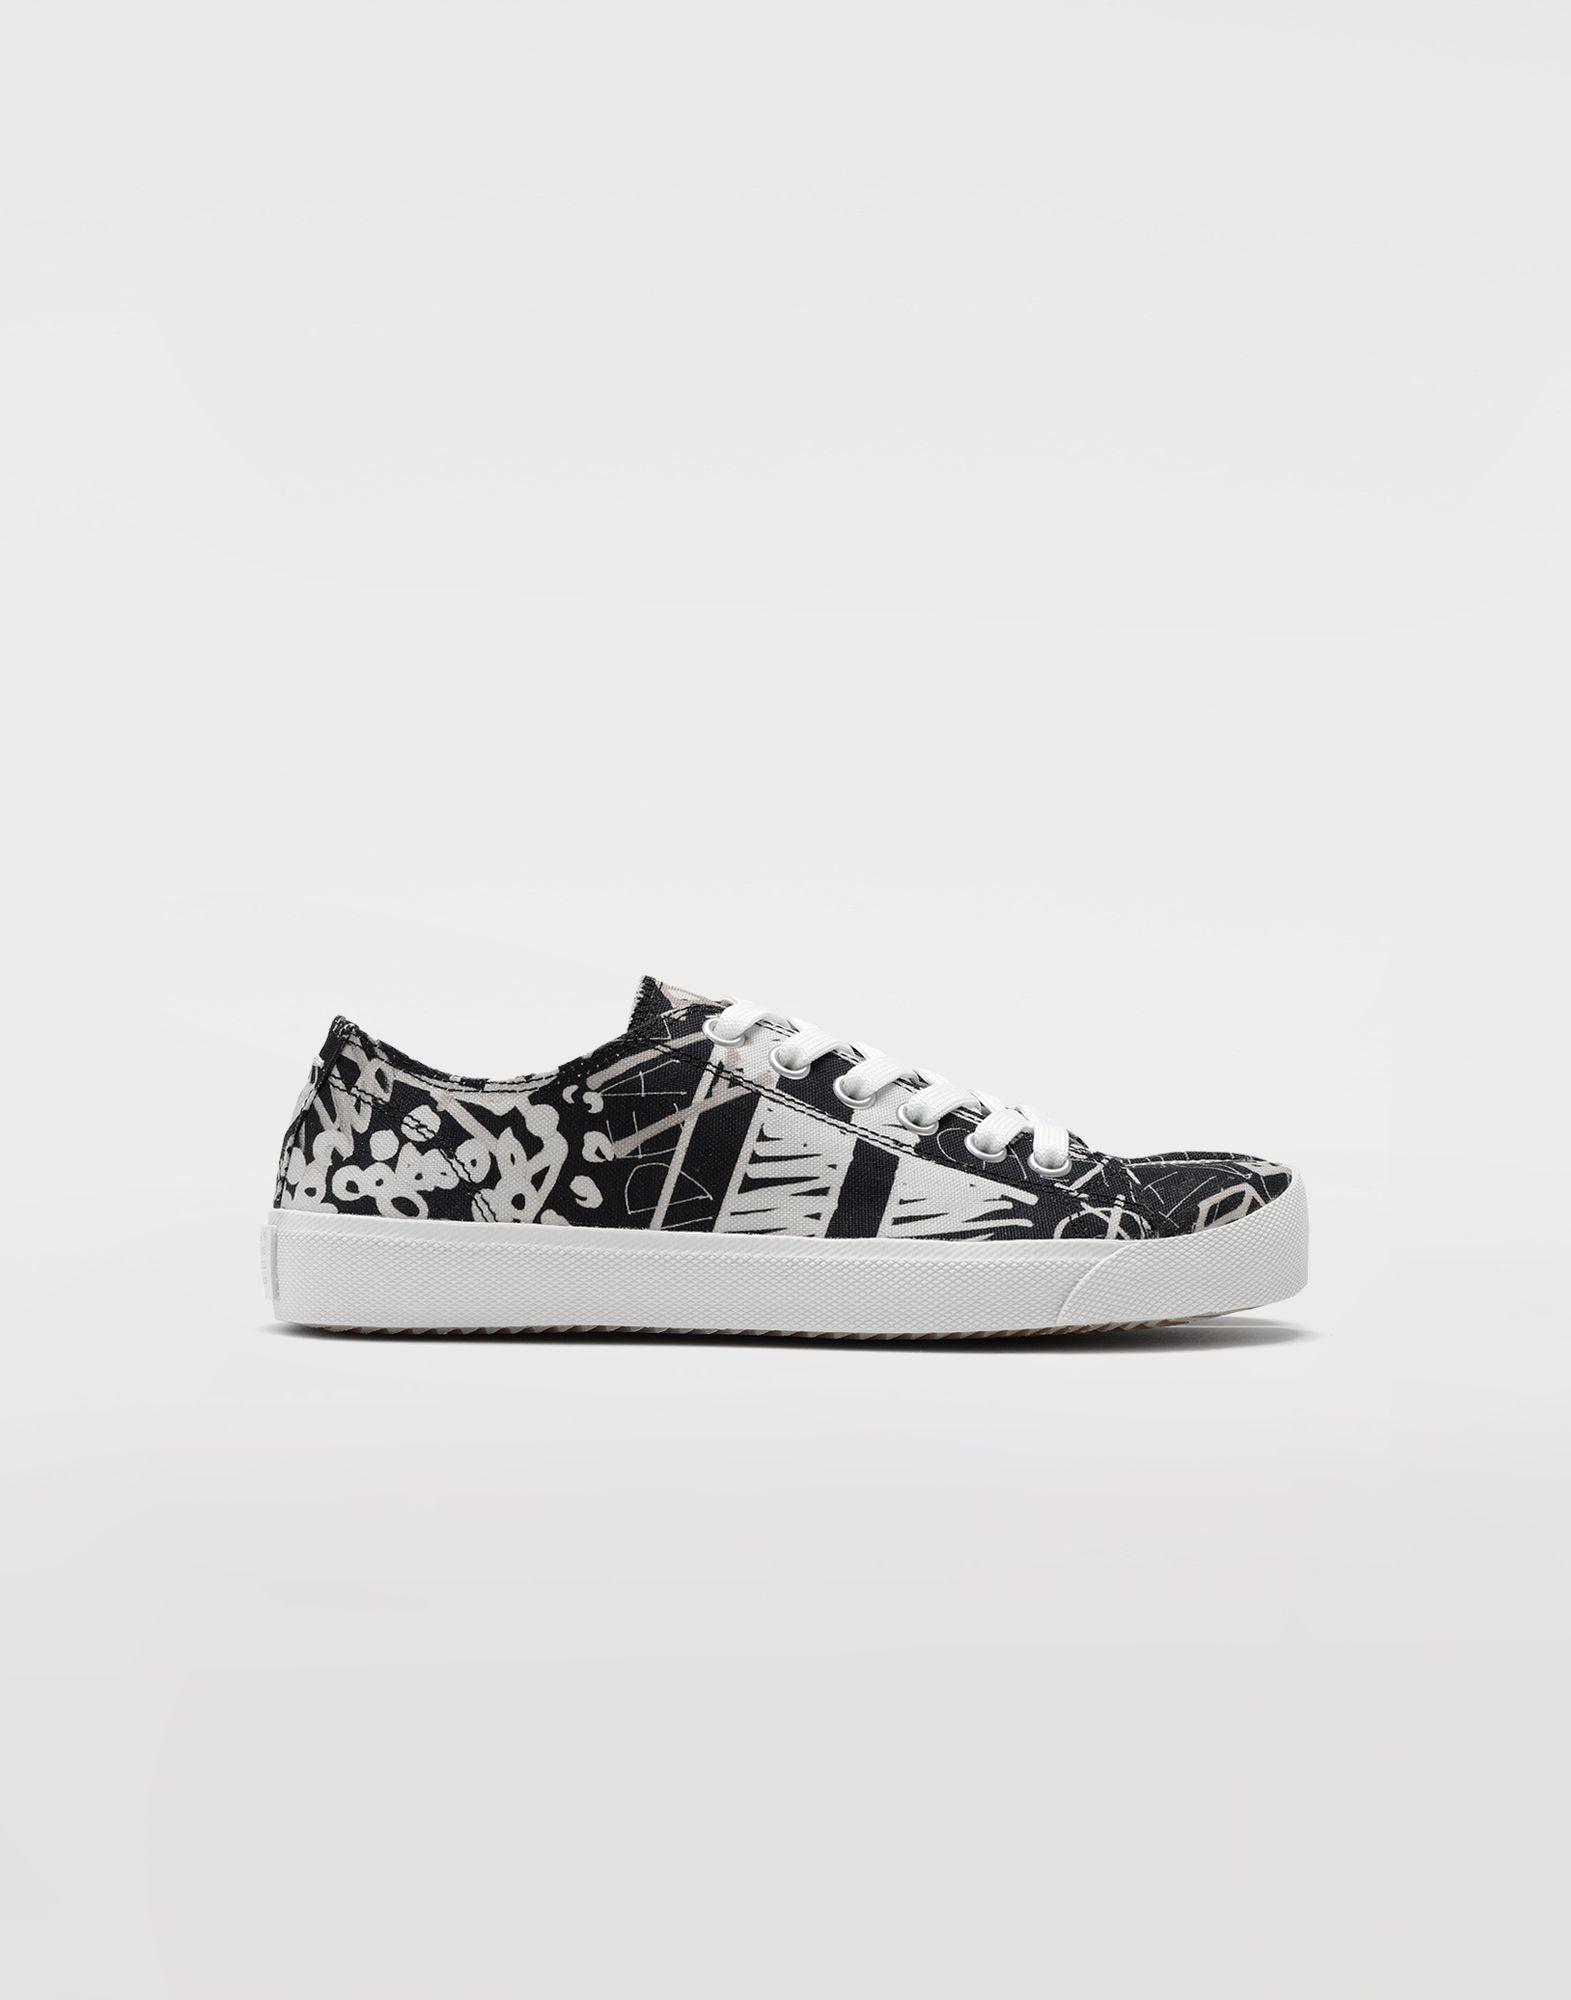 MAISON MARGIELA Graffiti Tabi sneakers Sneakers Tabi Woman f